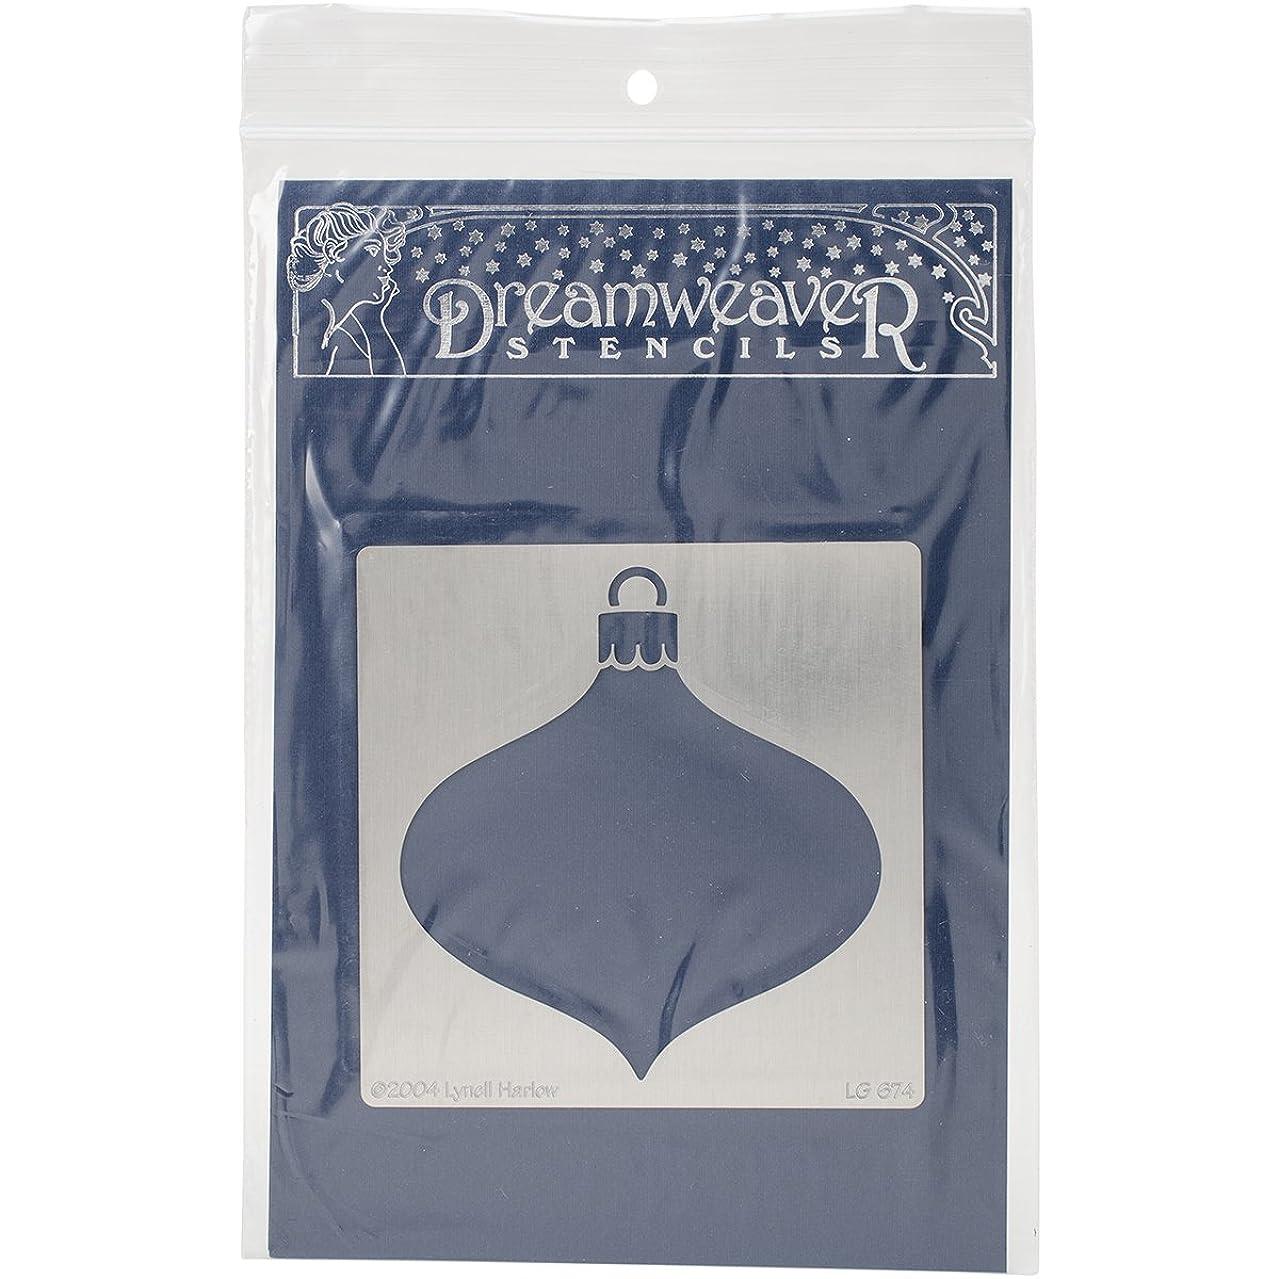 STAMPENDOUS Dreamweaver Metal Stencil, Oval Ornament